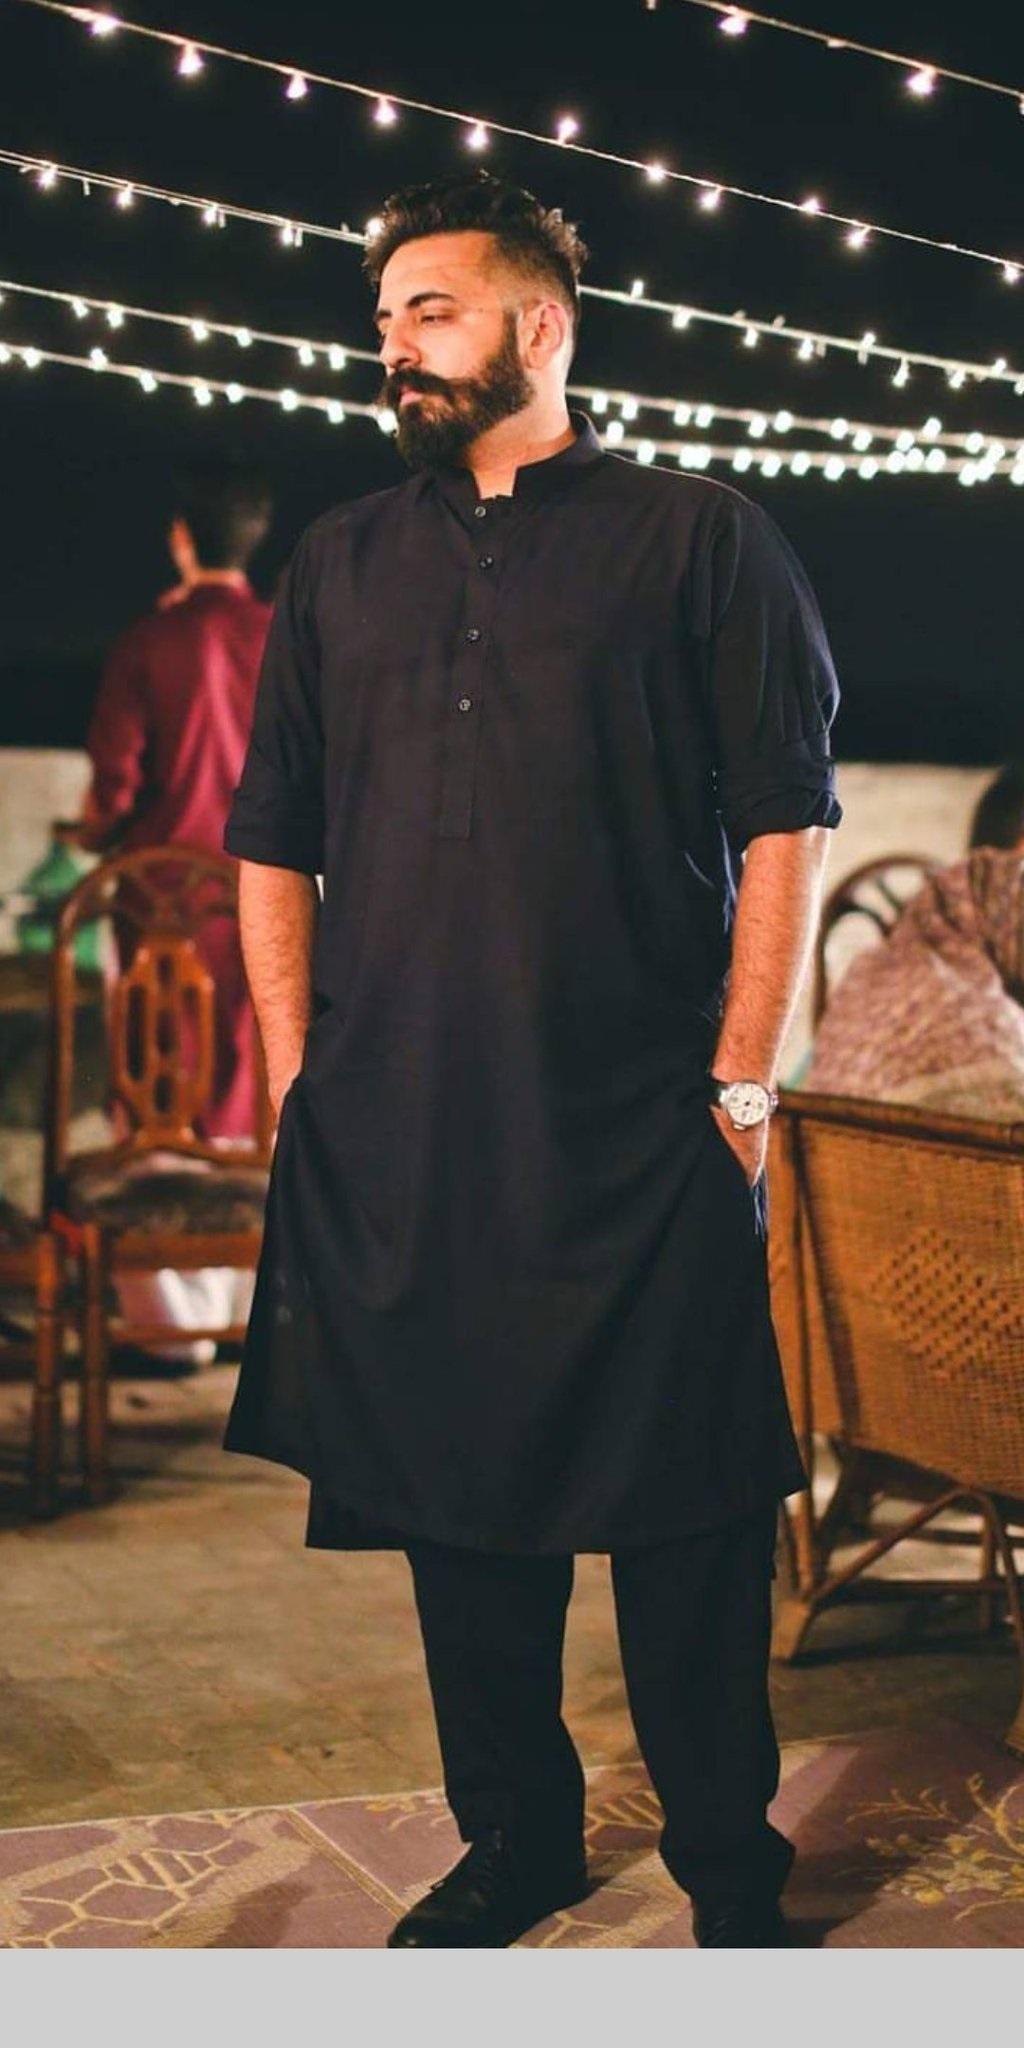 rizwan pehelwan, groom, budget wedding, Pakistani wedding